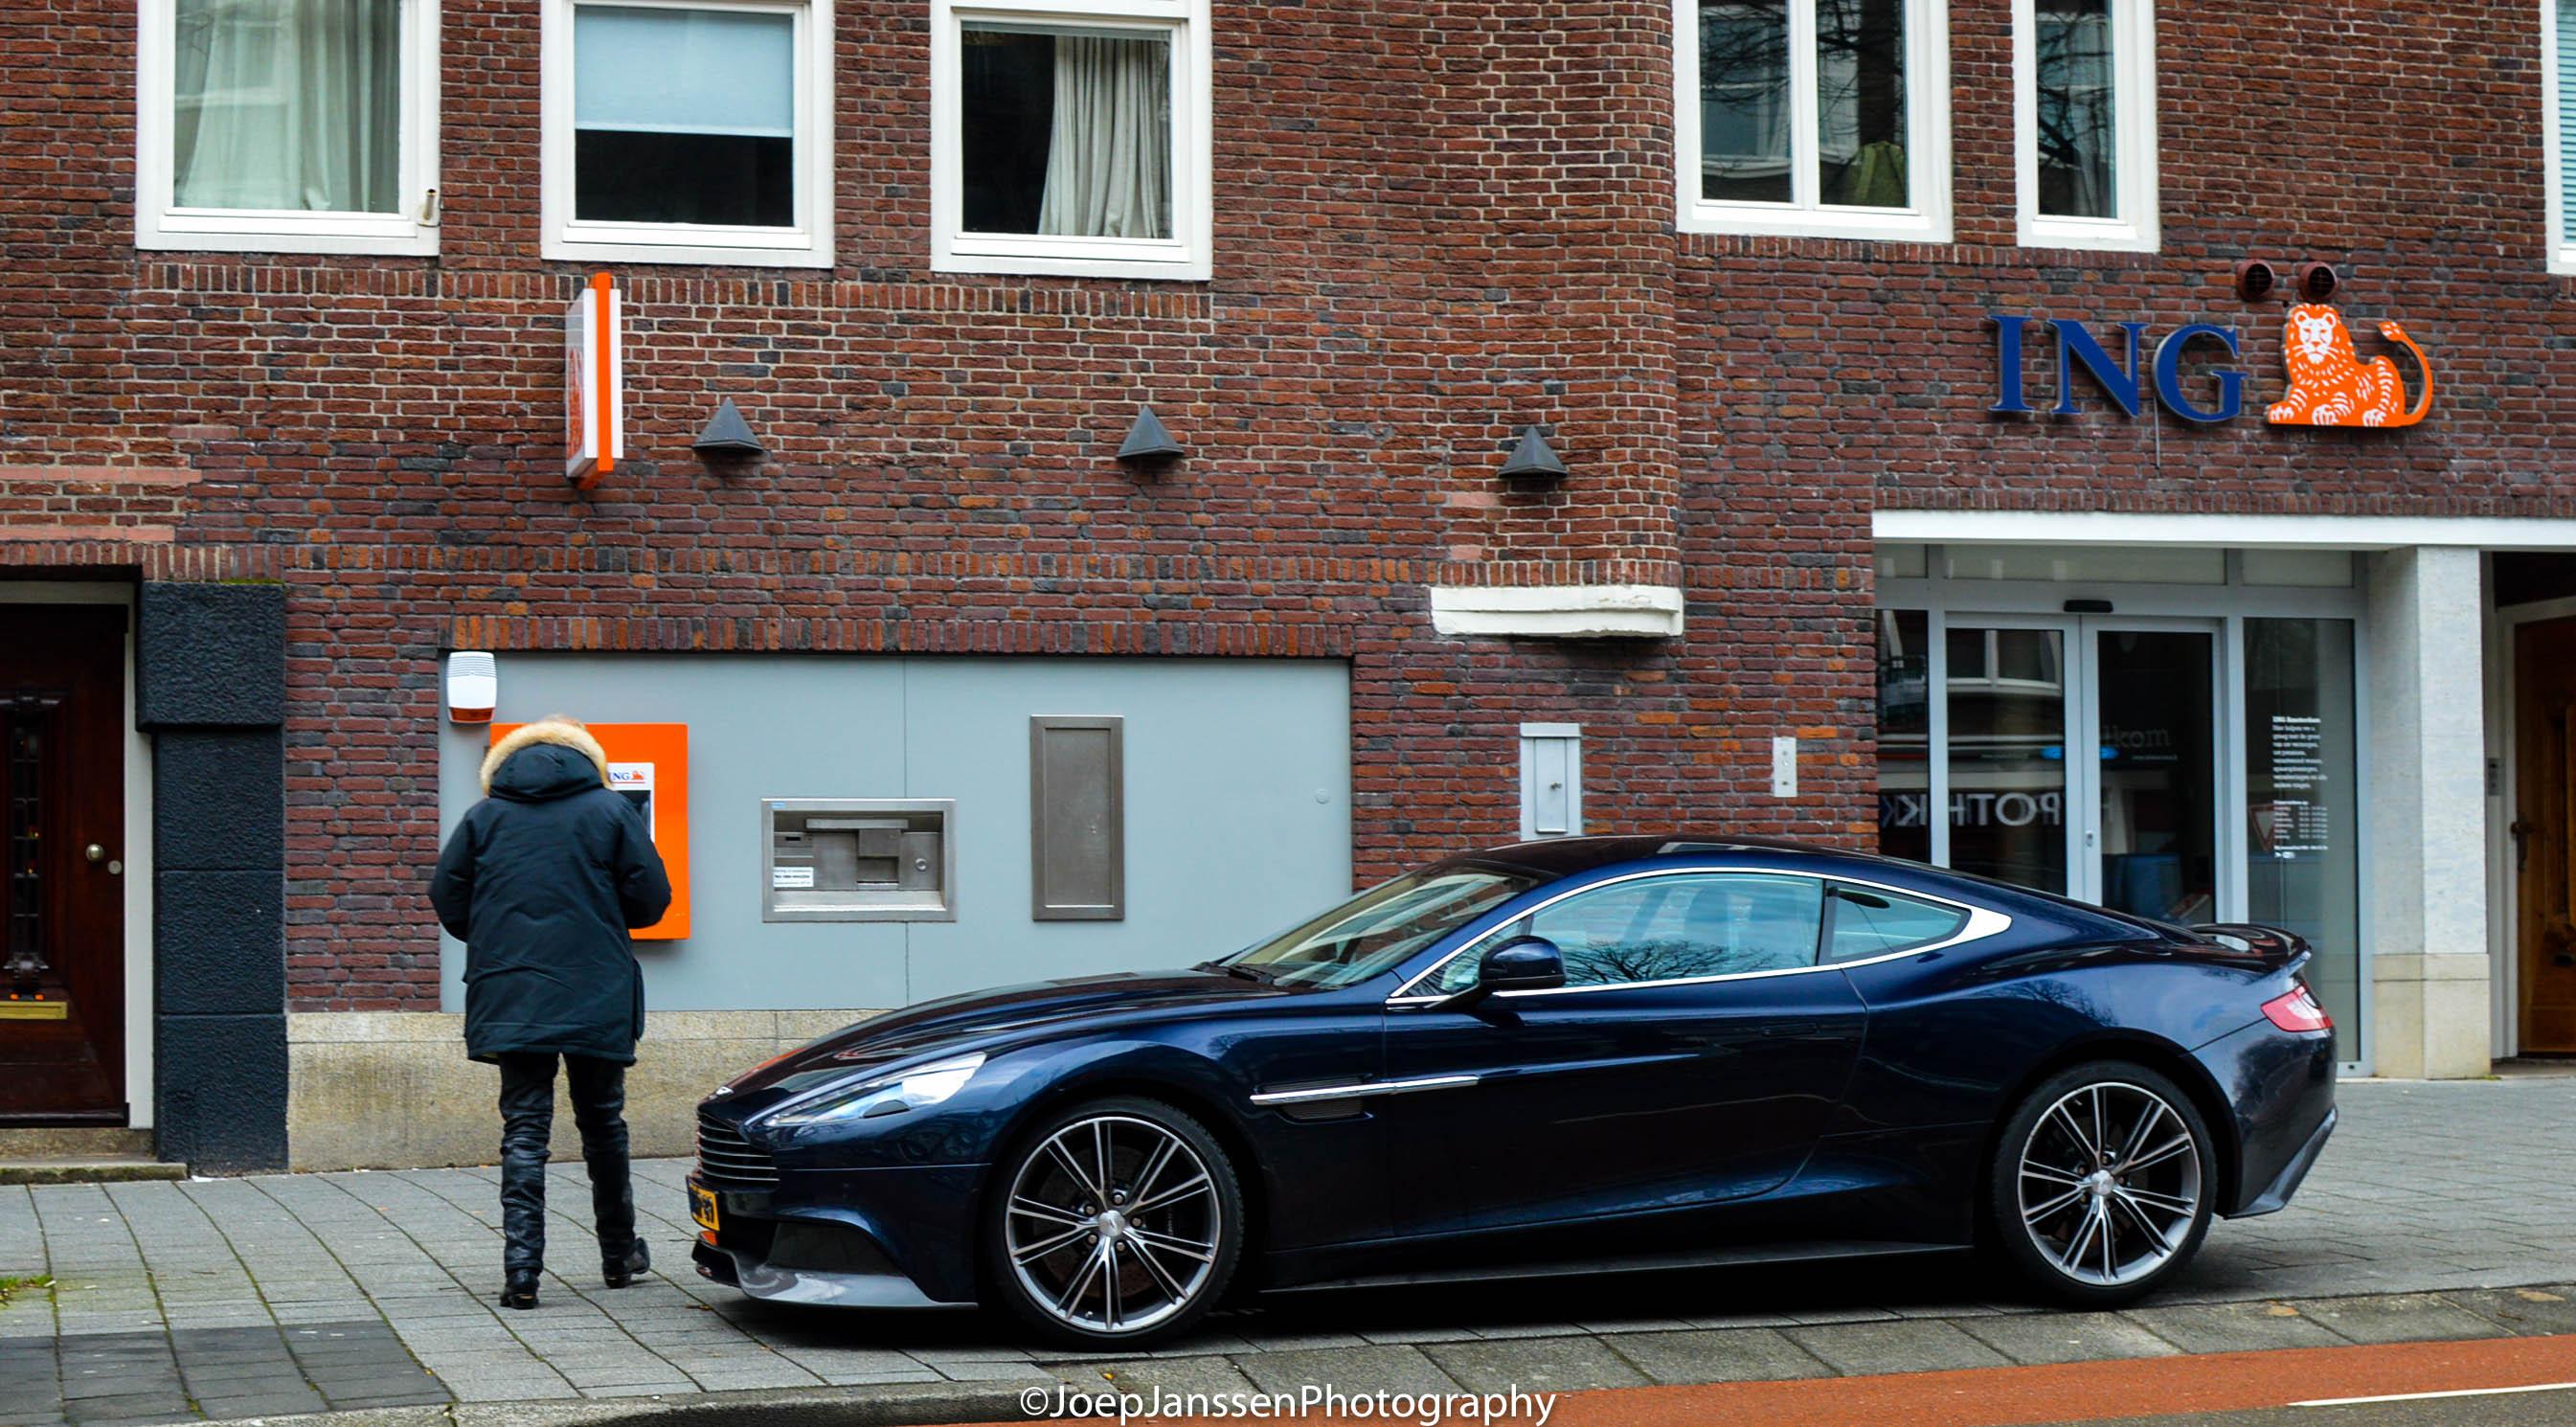 A Nice Dark Blue Aston Martin Vanquish